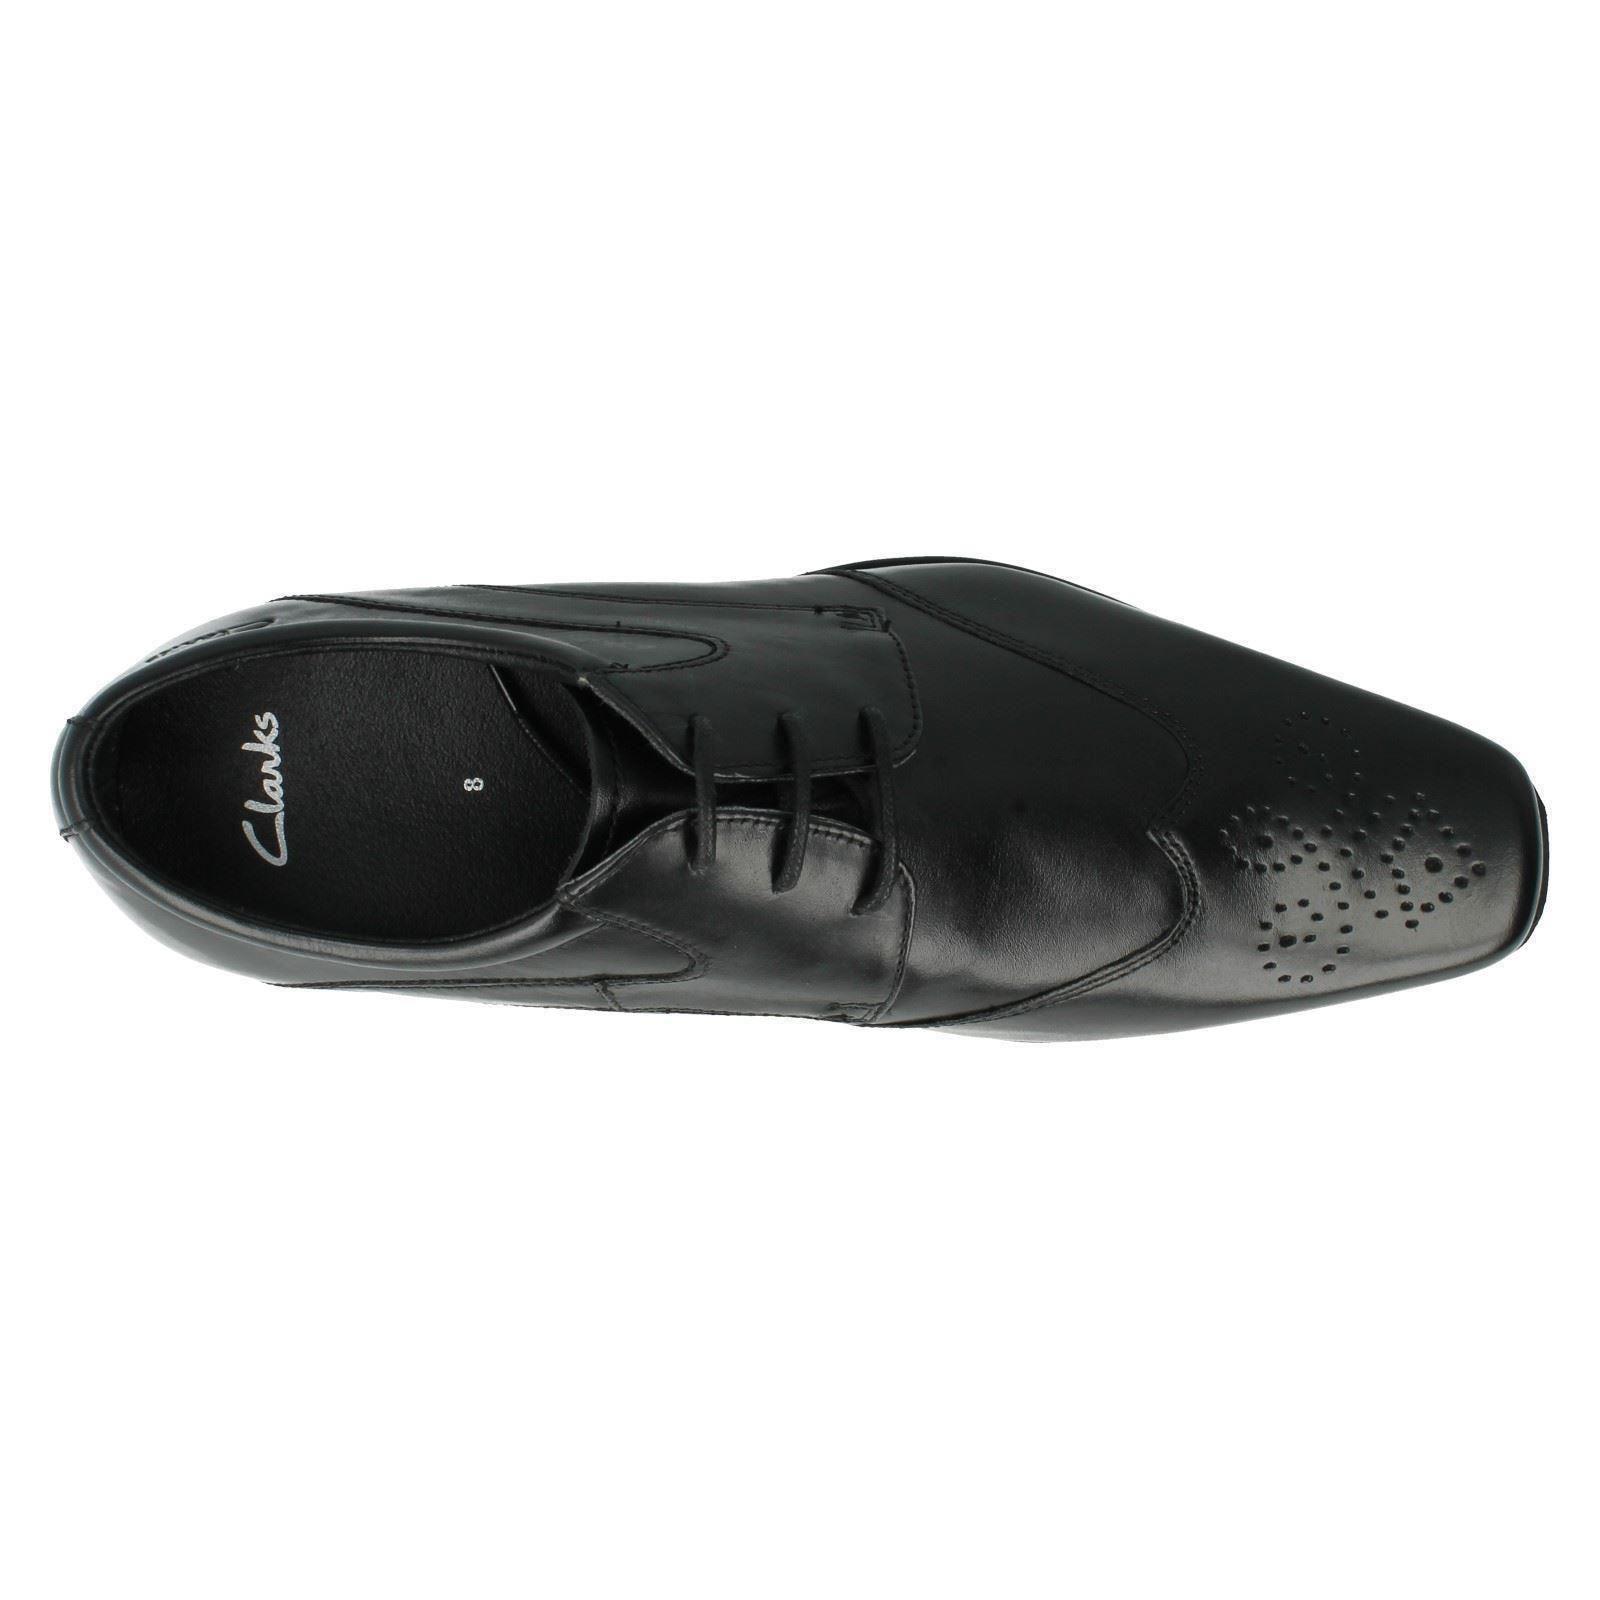 Para Hombre Clarks Formales Zapatos Etiqueta-Affix Moscú